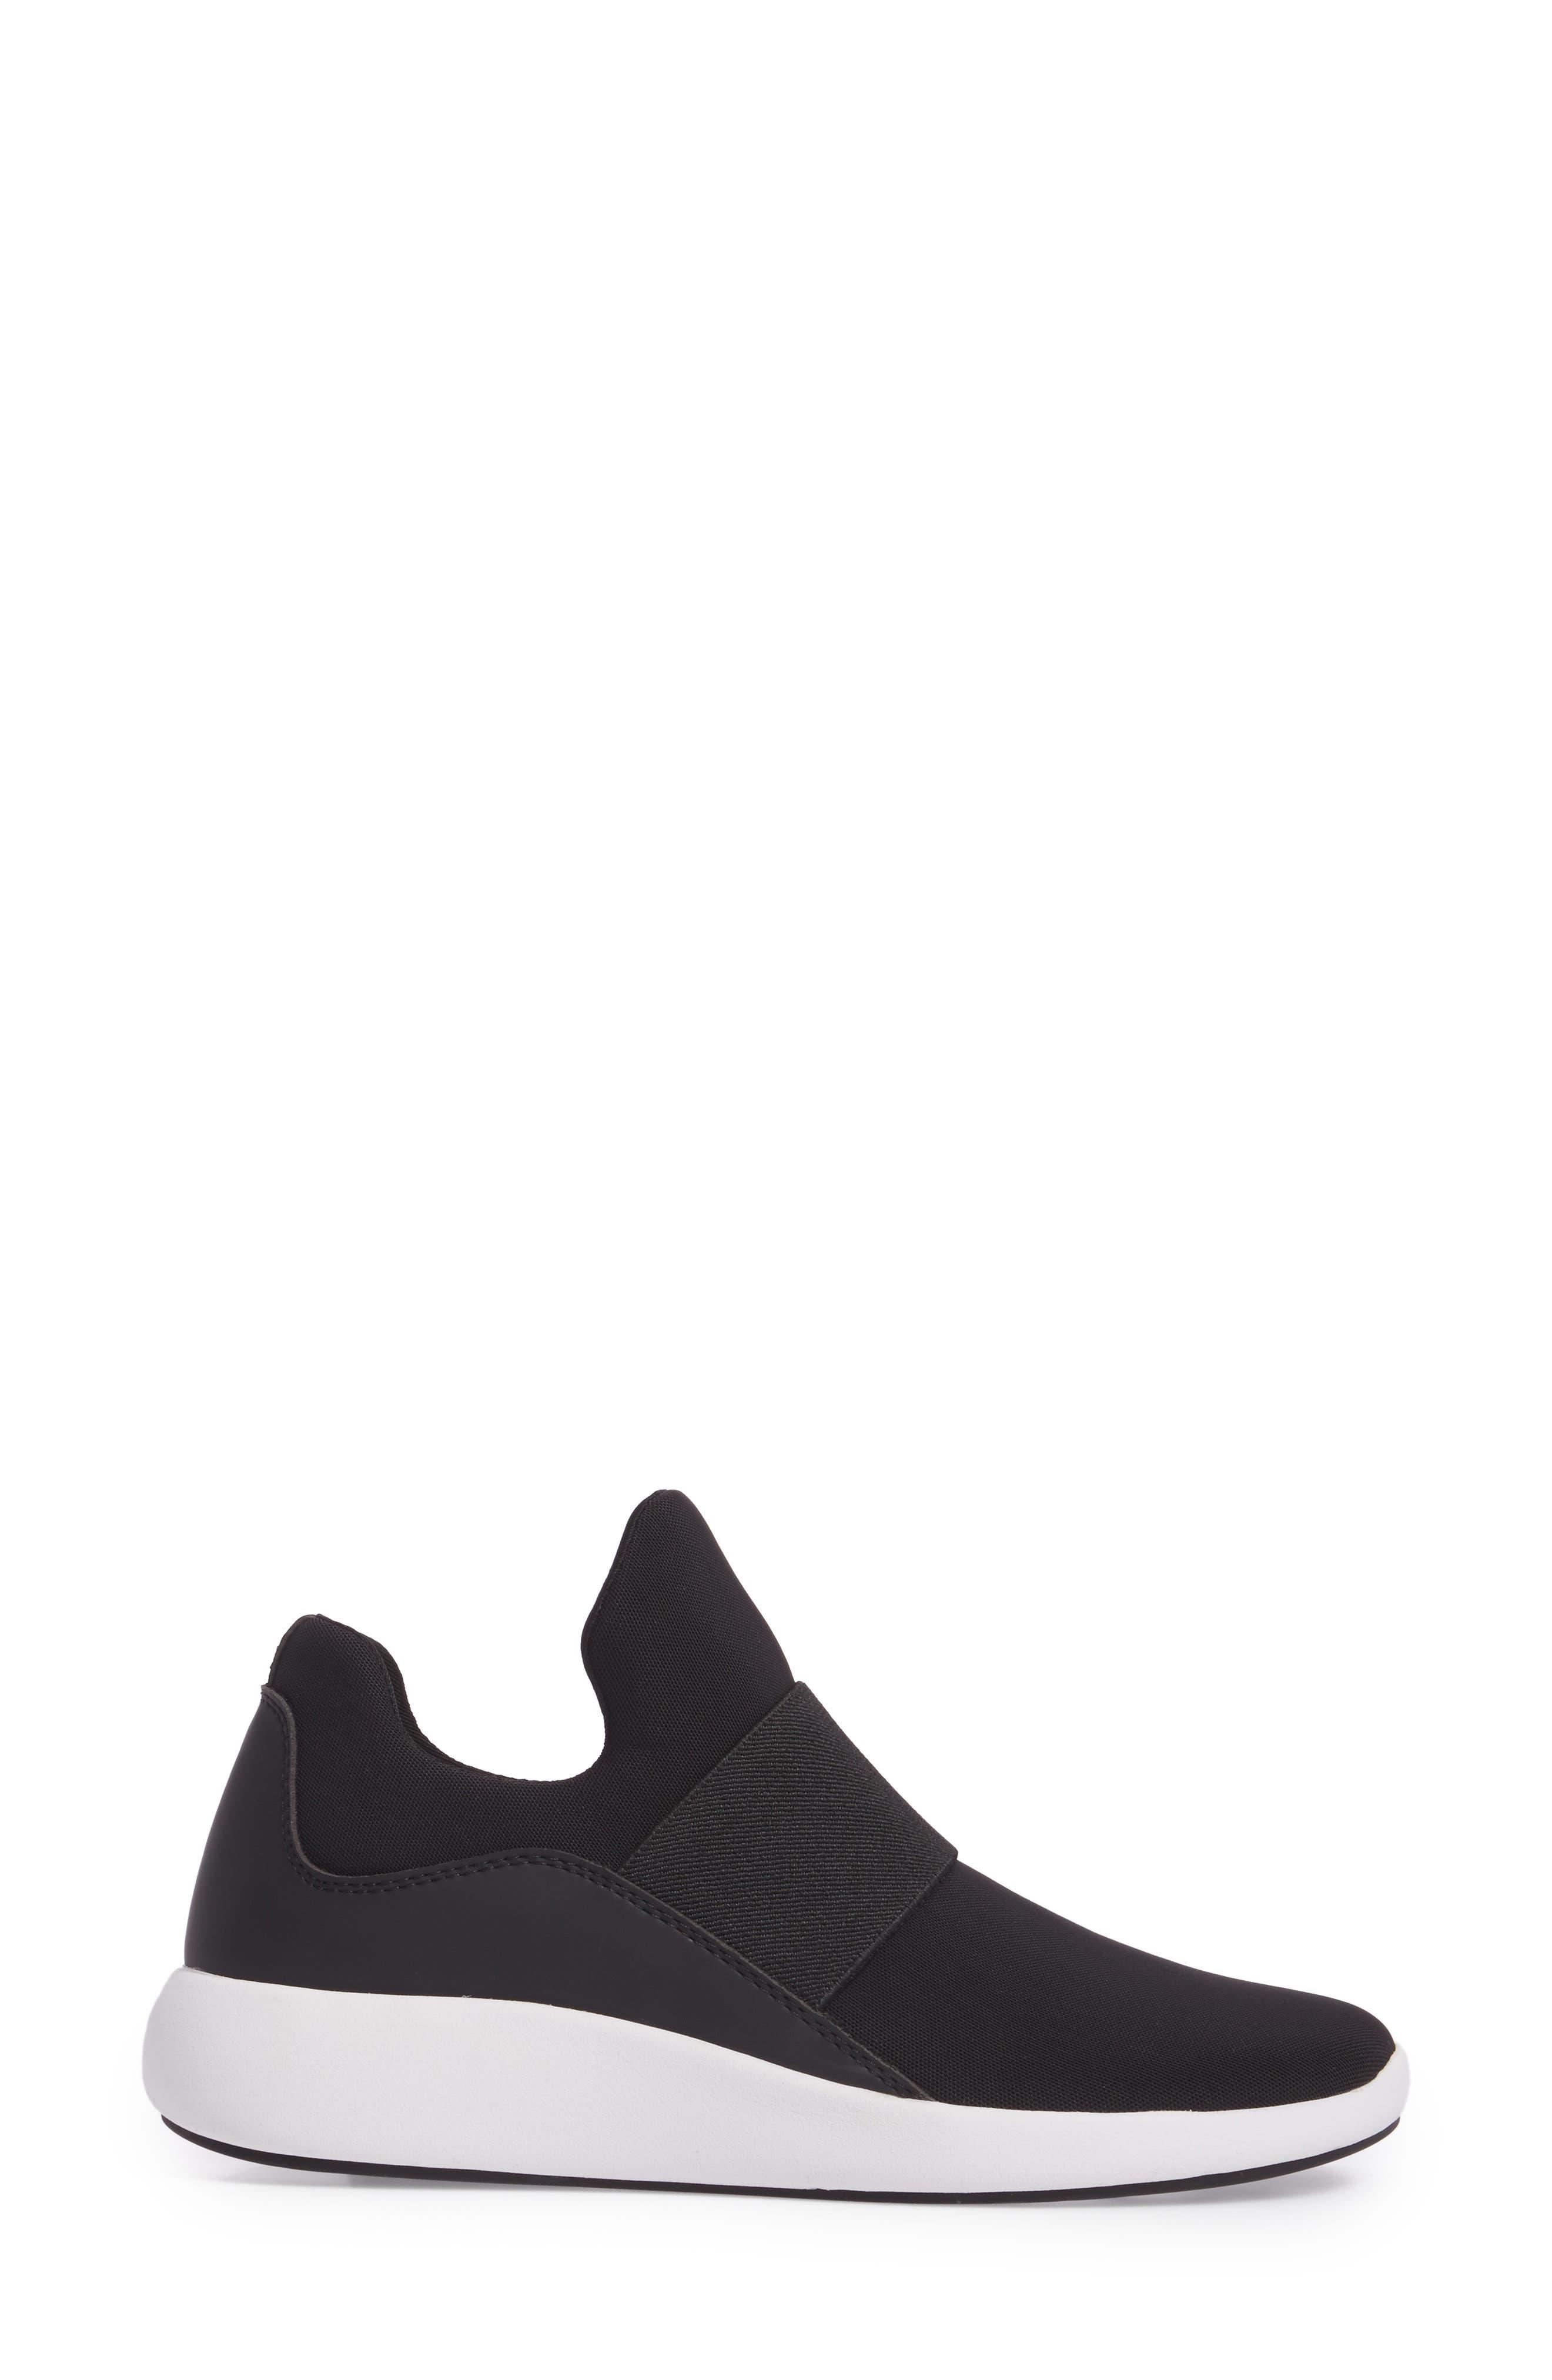 Donna Karan Cory Slip-On Sneaker,                             Alternate thumbnail 3, color,                             001